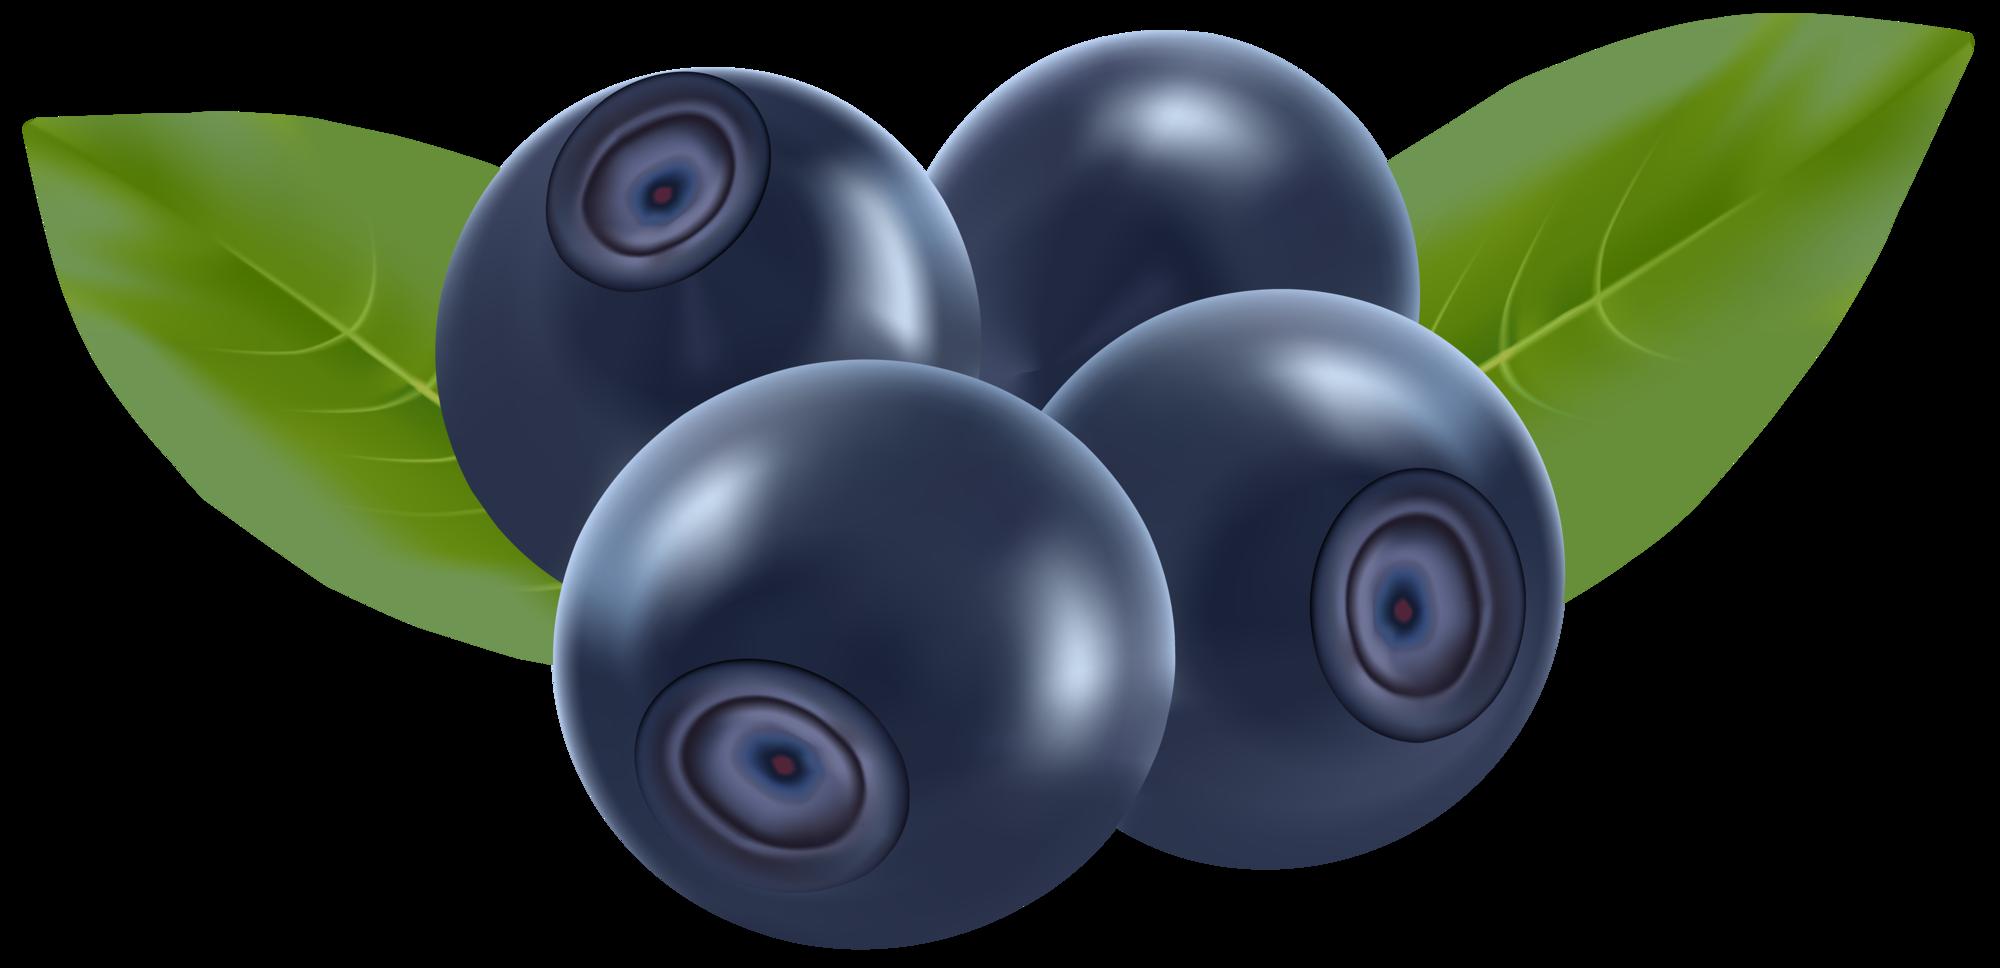 Blueberries png clip art. Wheel clipart blue